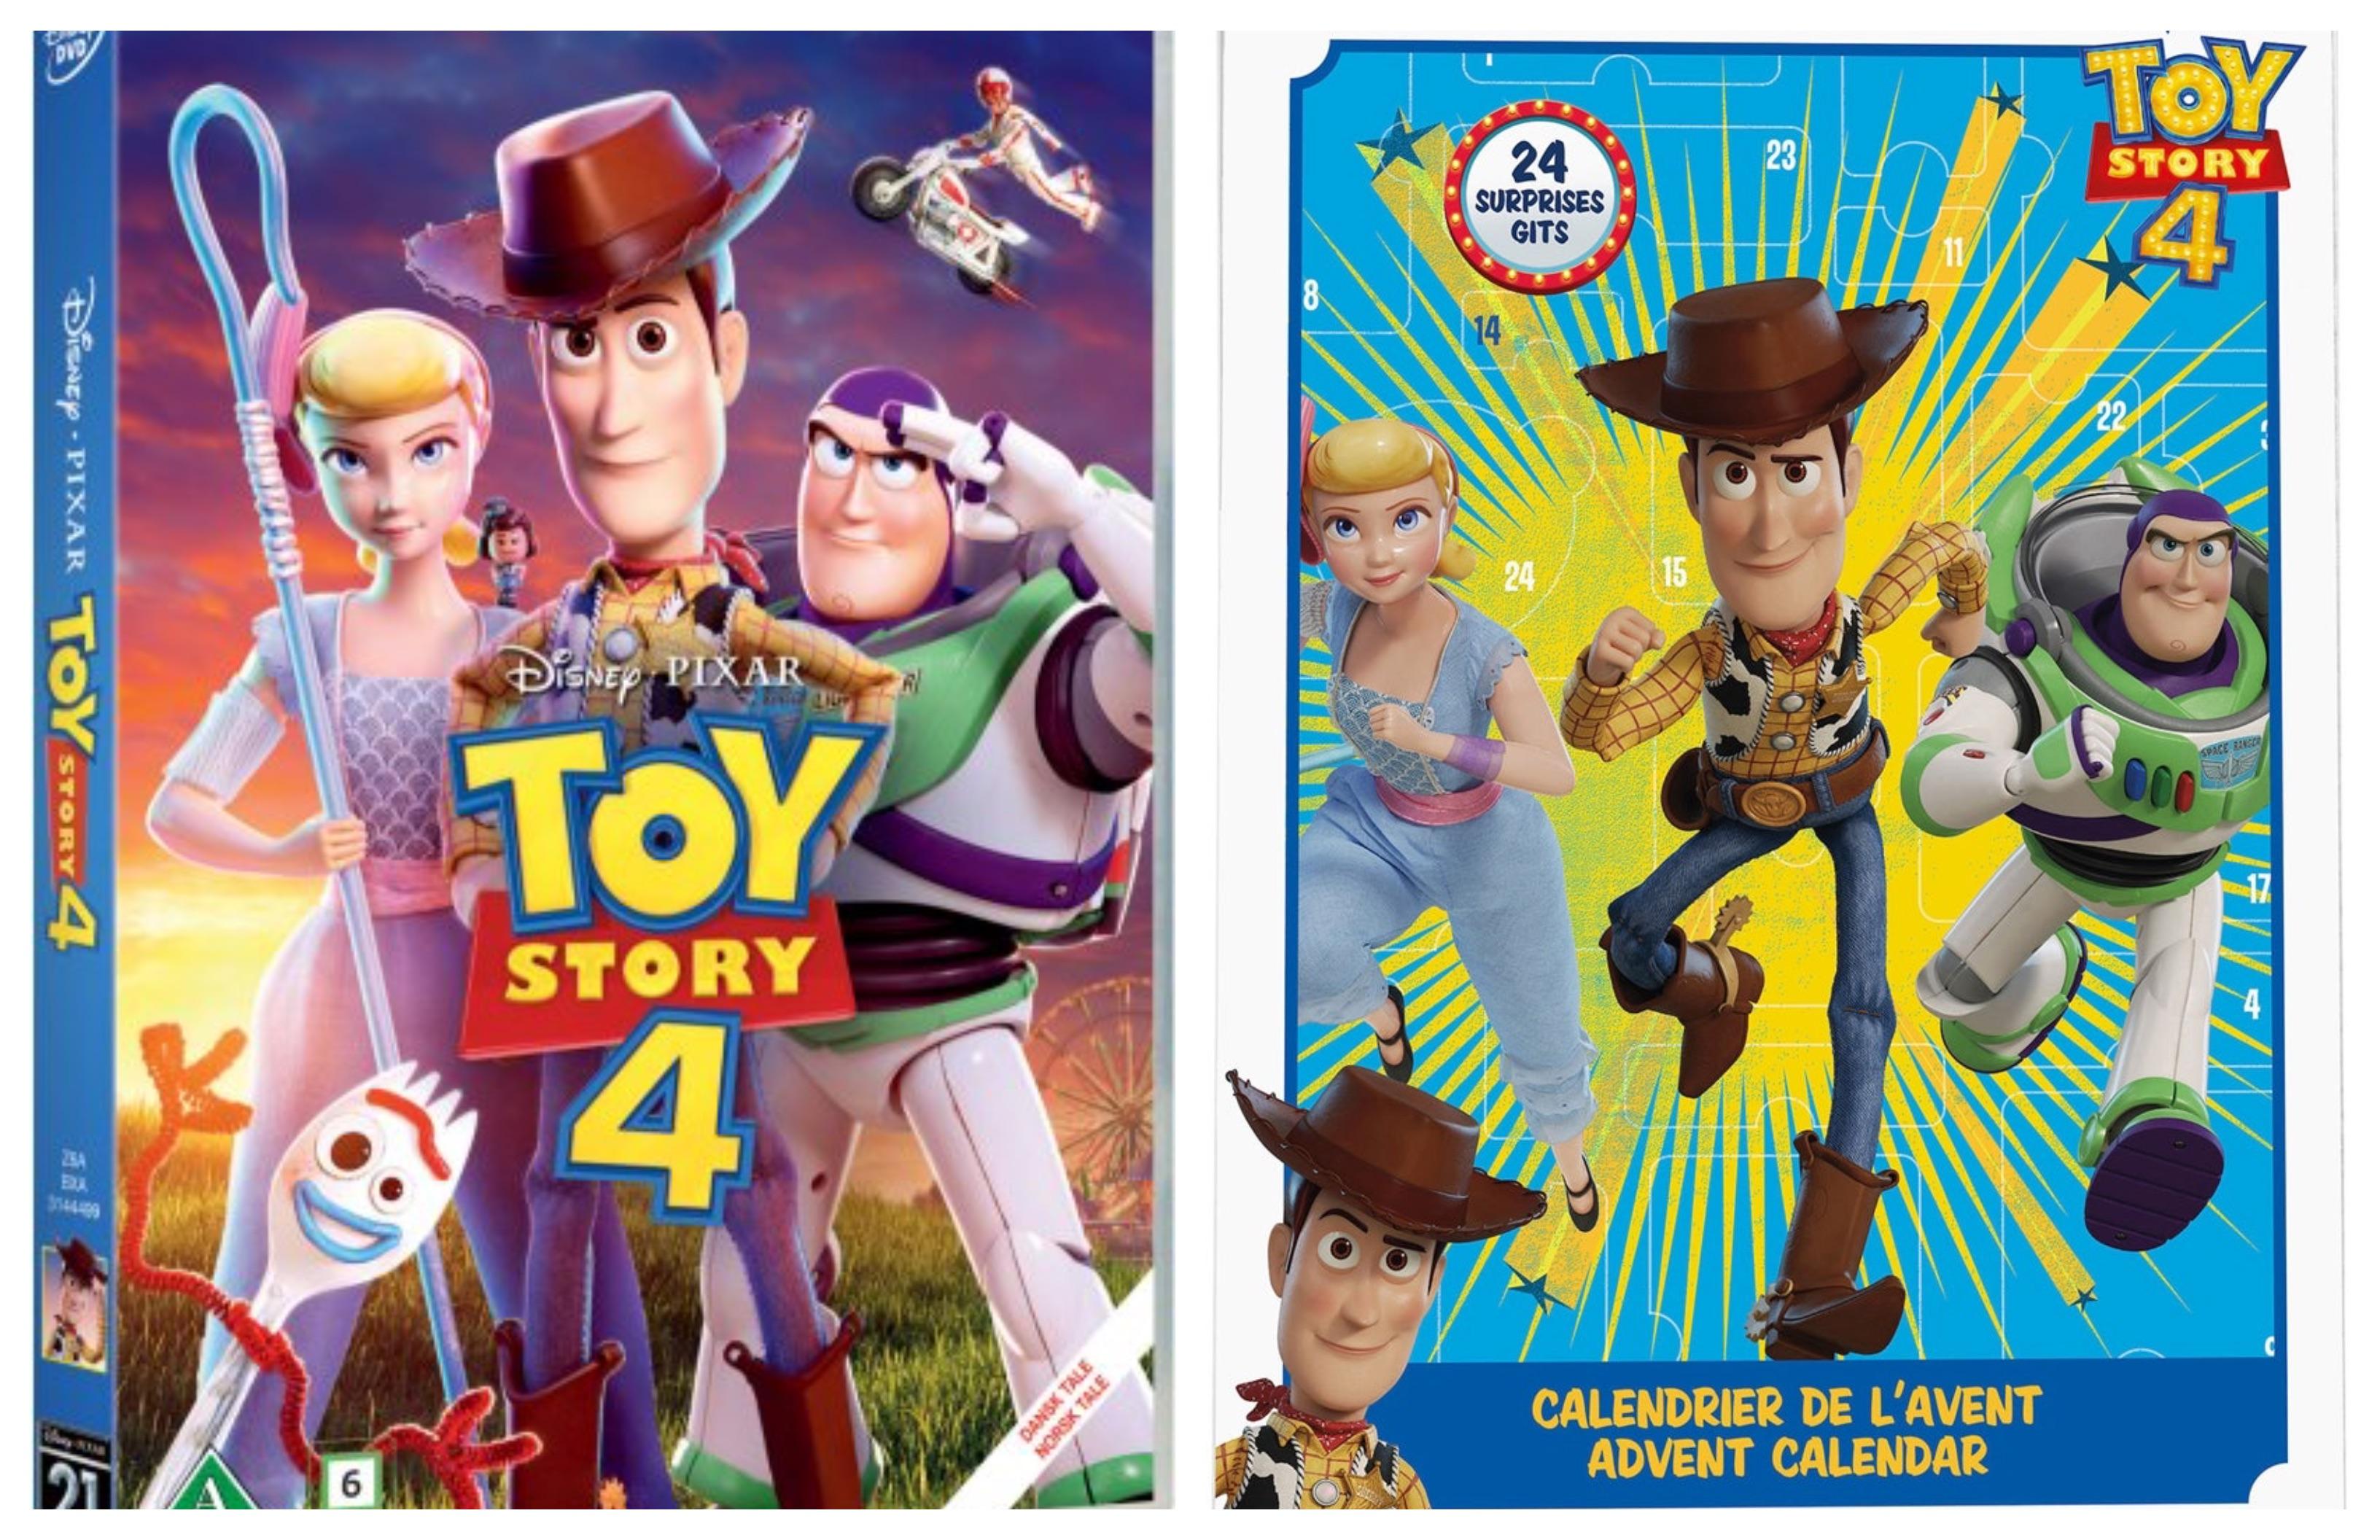 Toy Story 4 julekalender